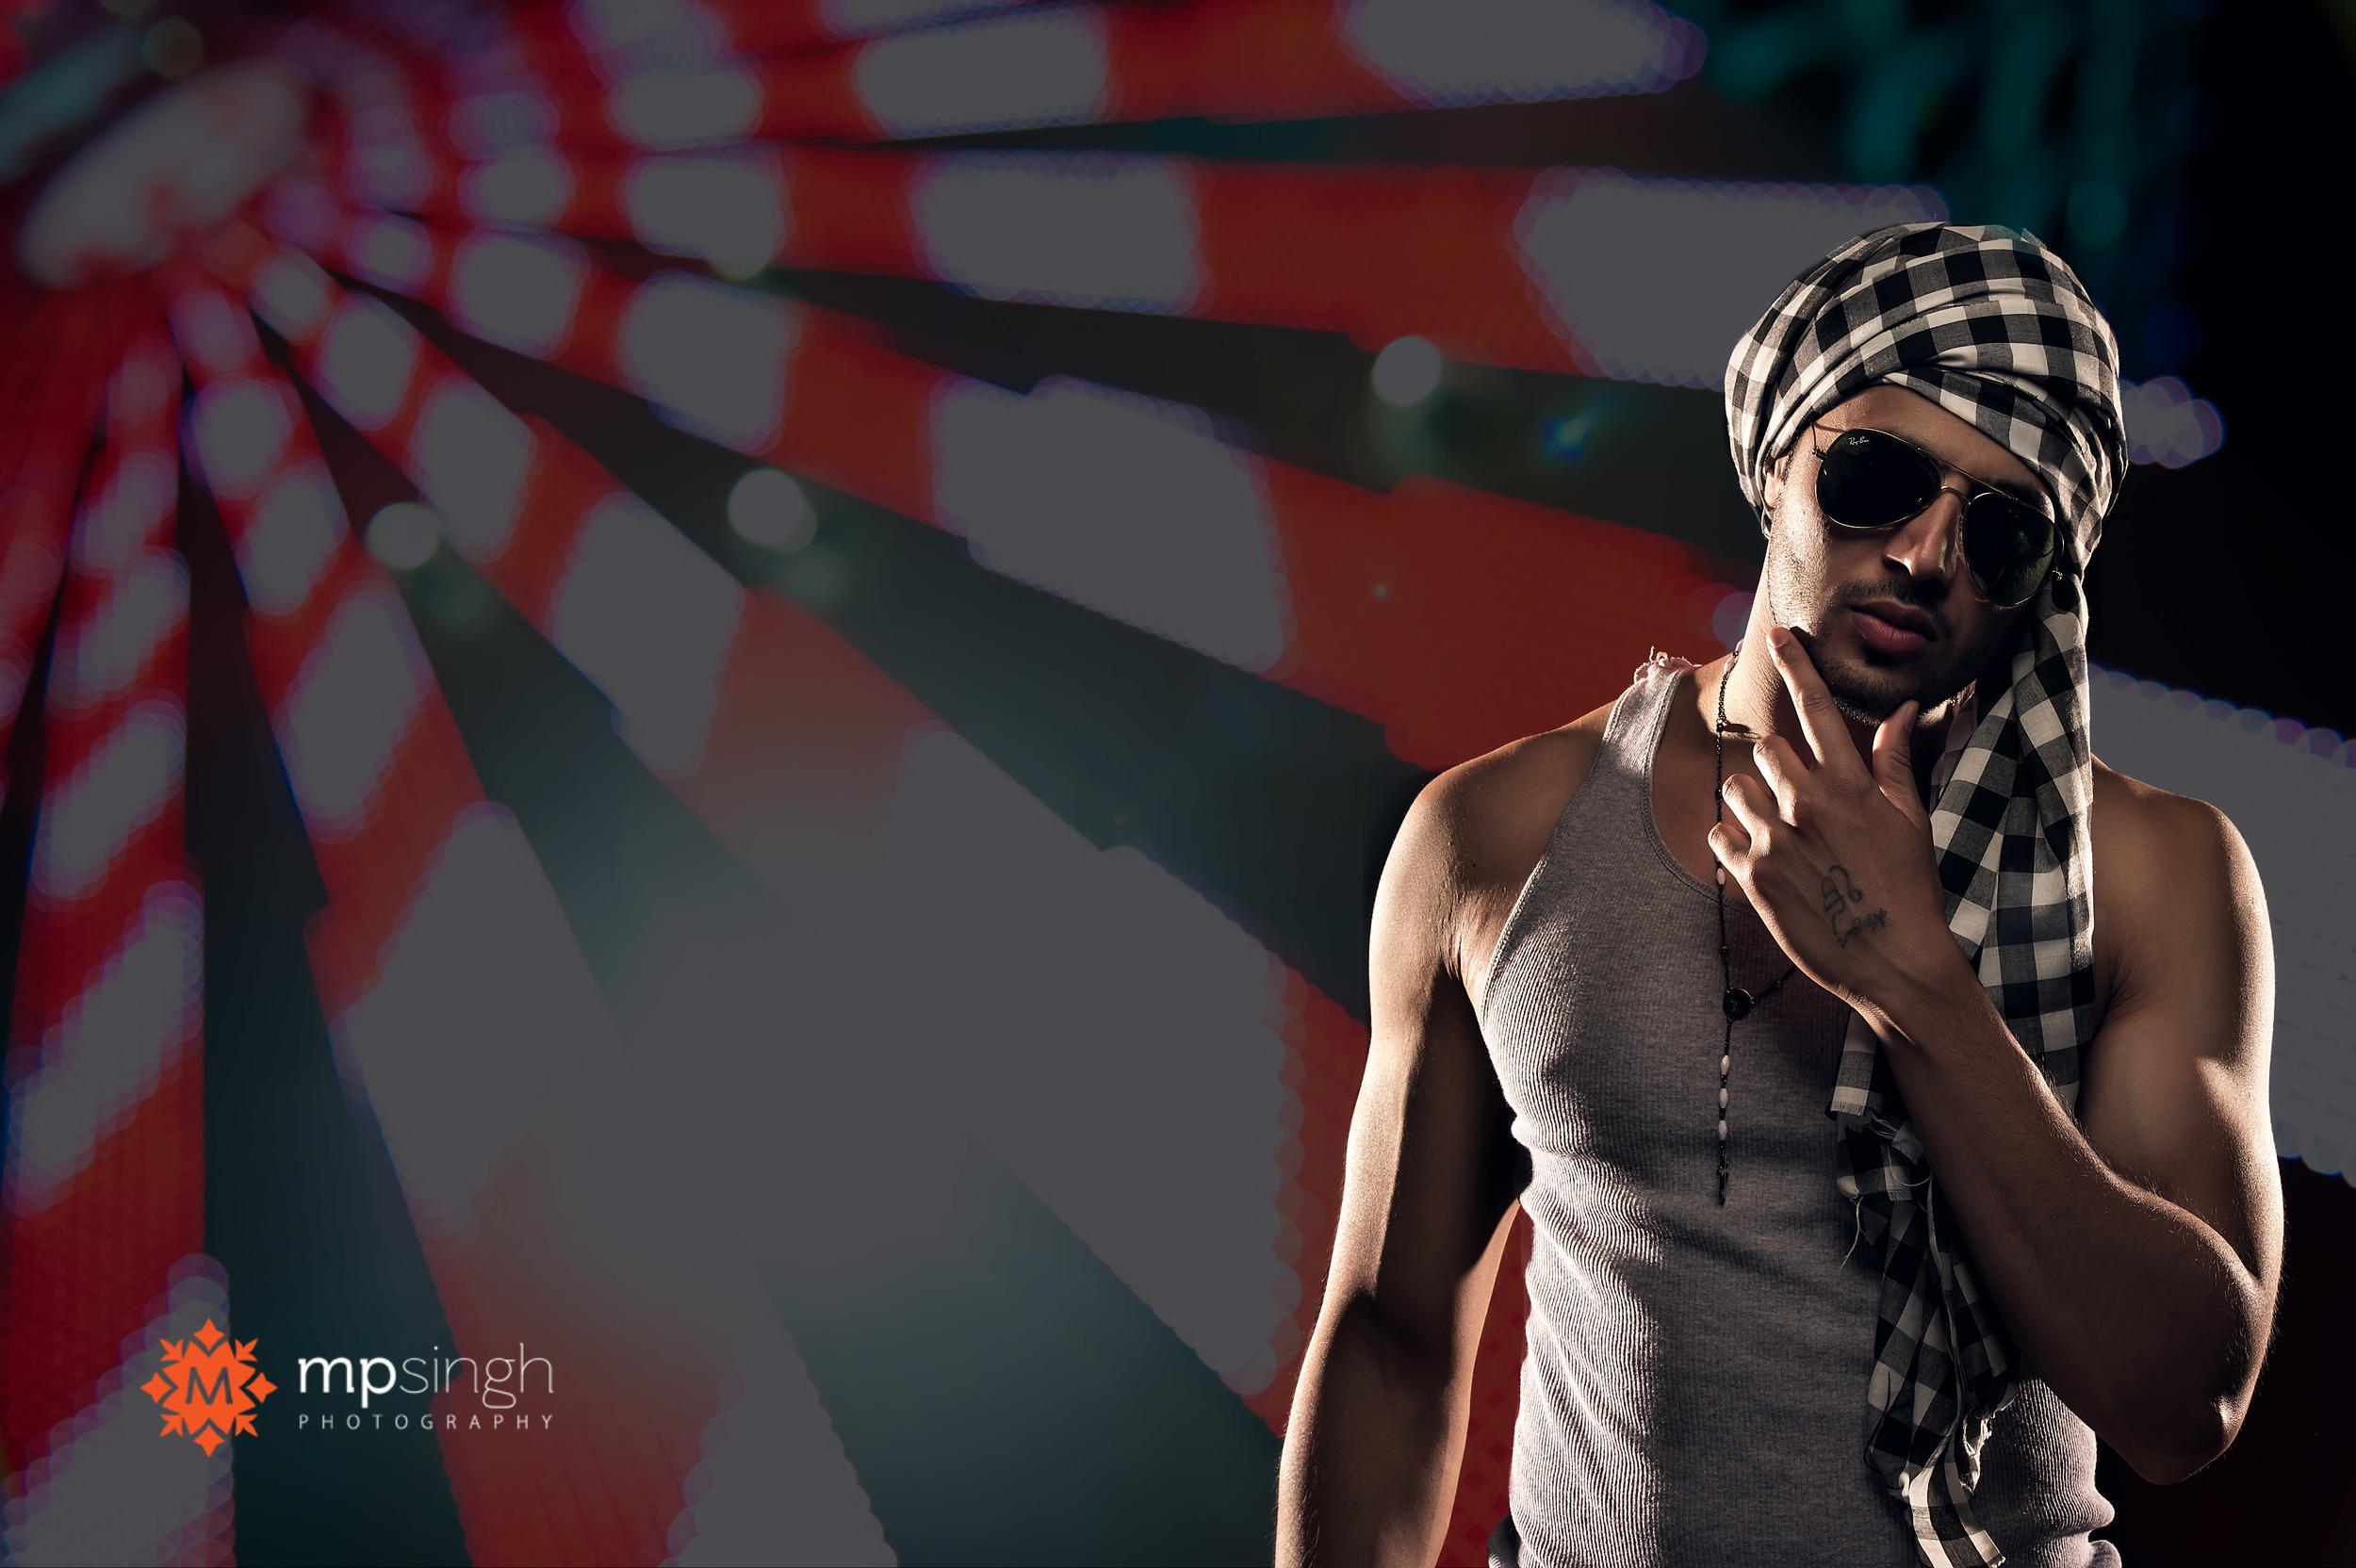 MP Singh Photography-1-5.jpg